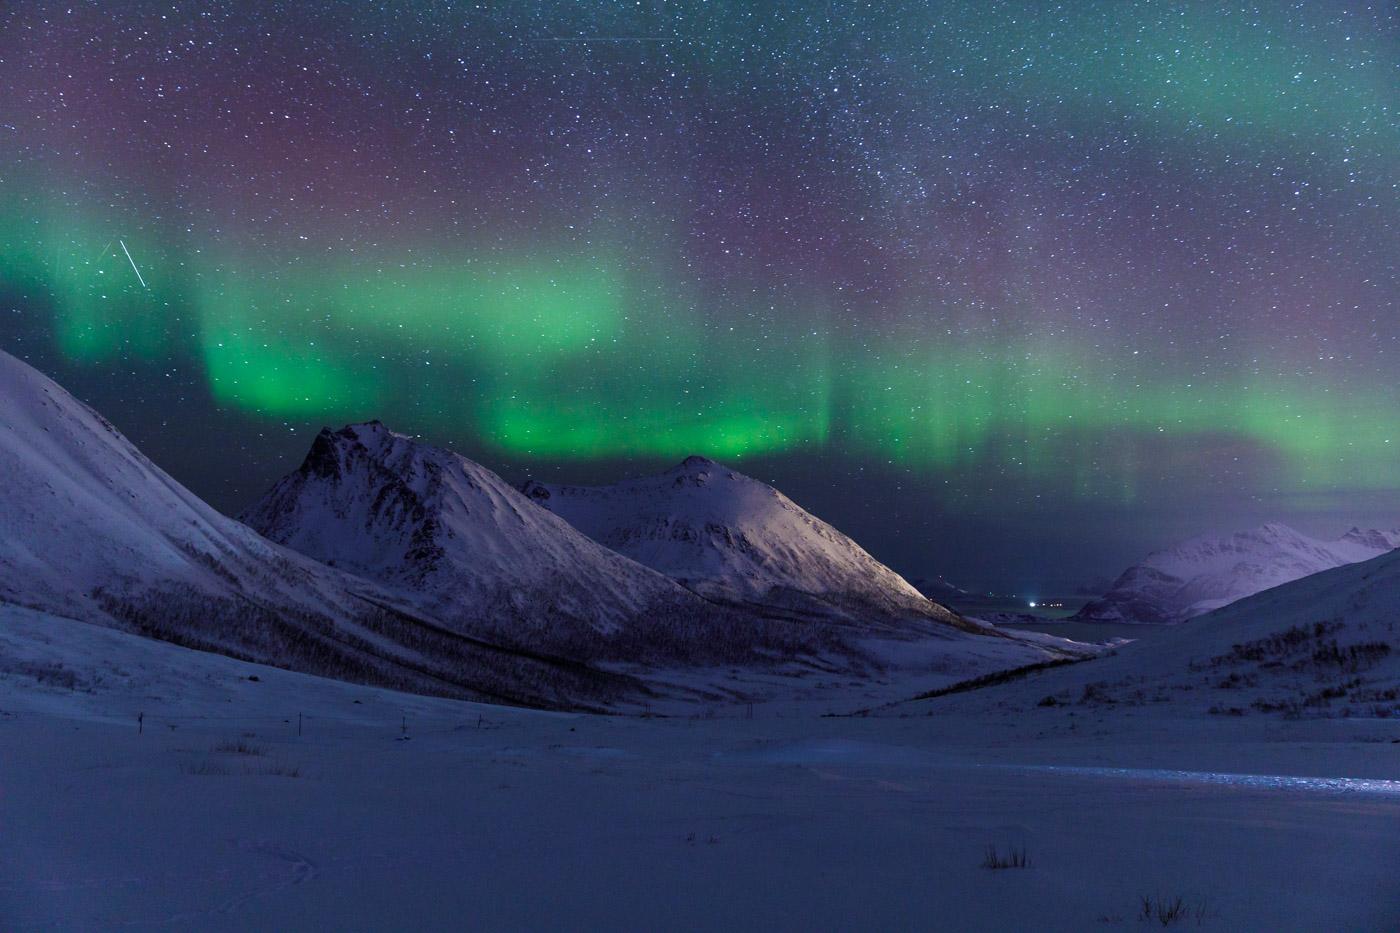 The northern lights or aurora borealis